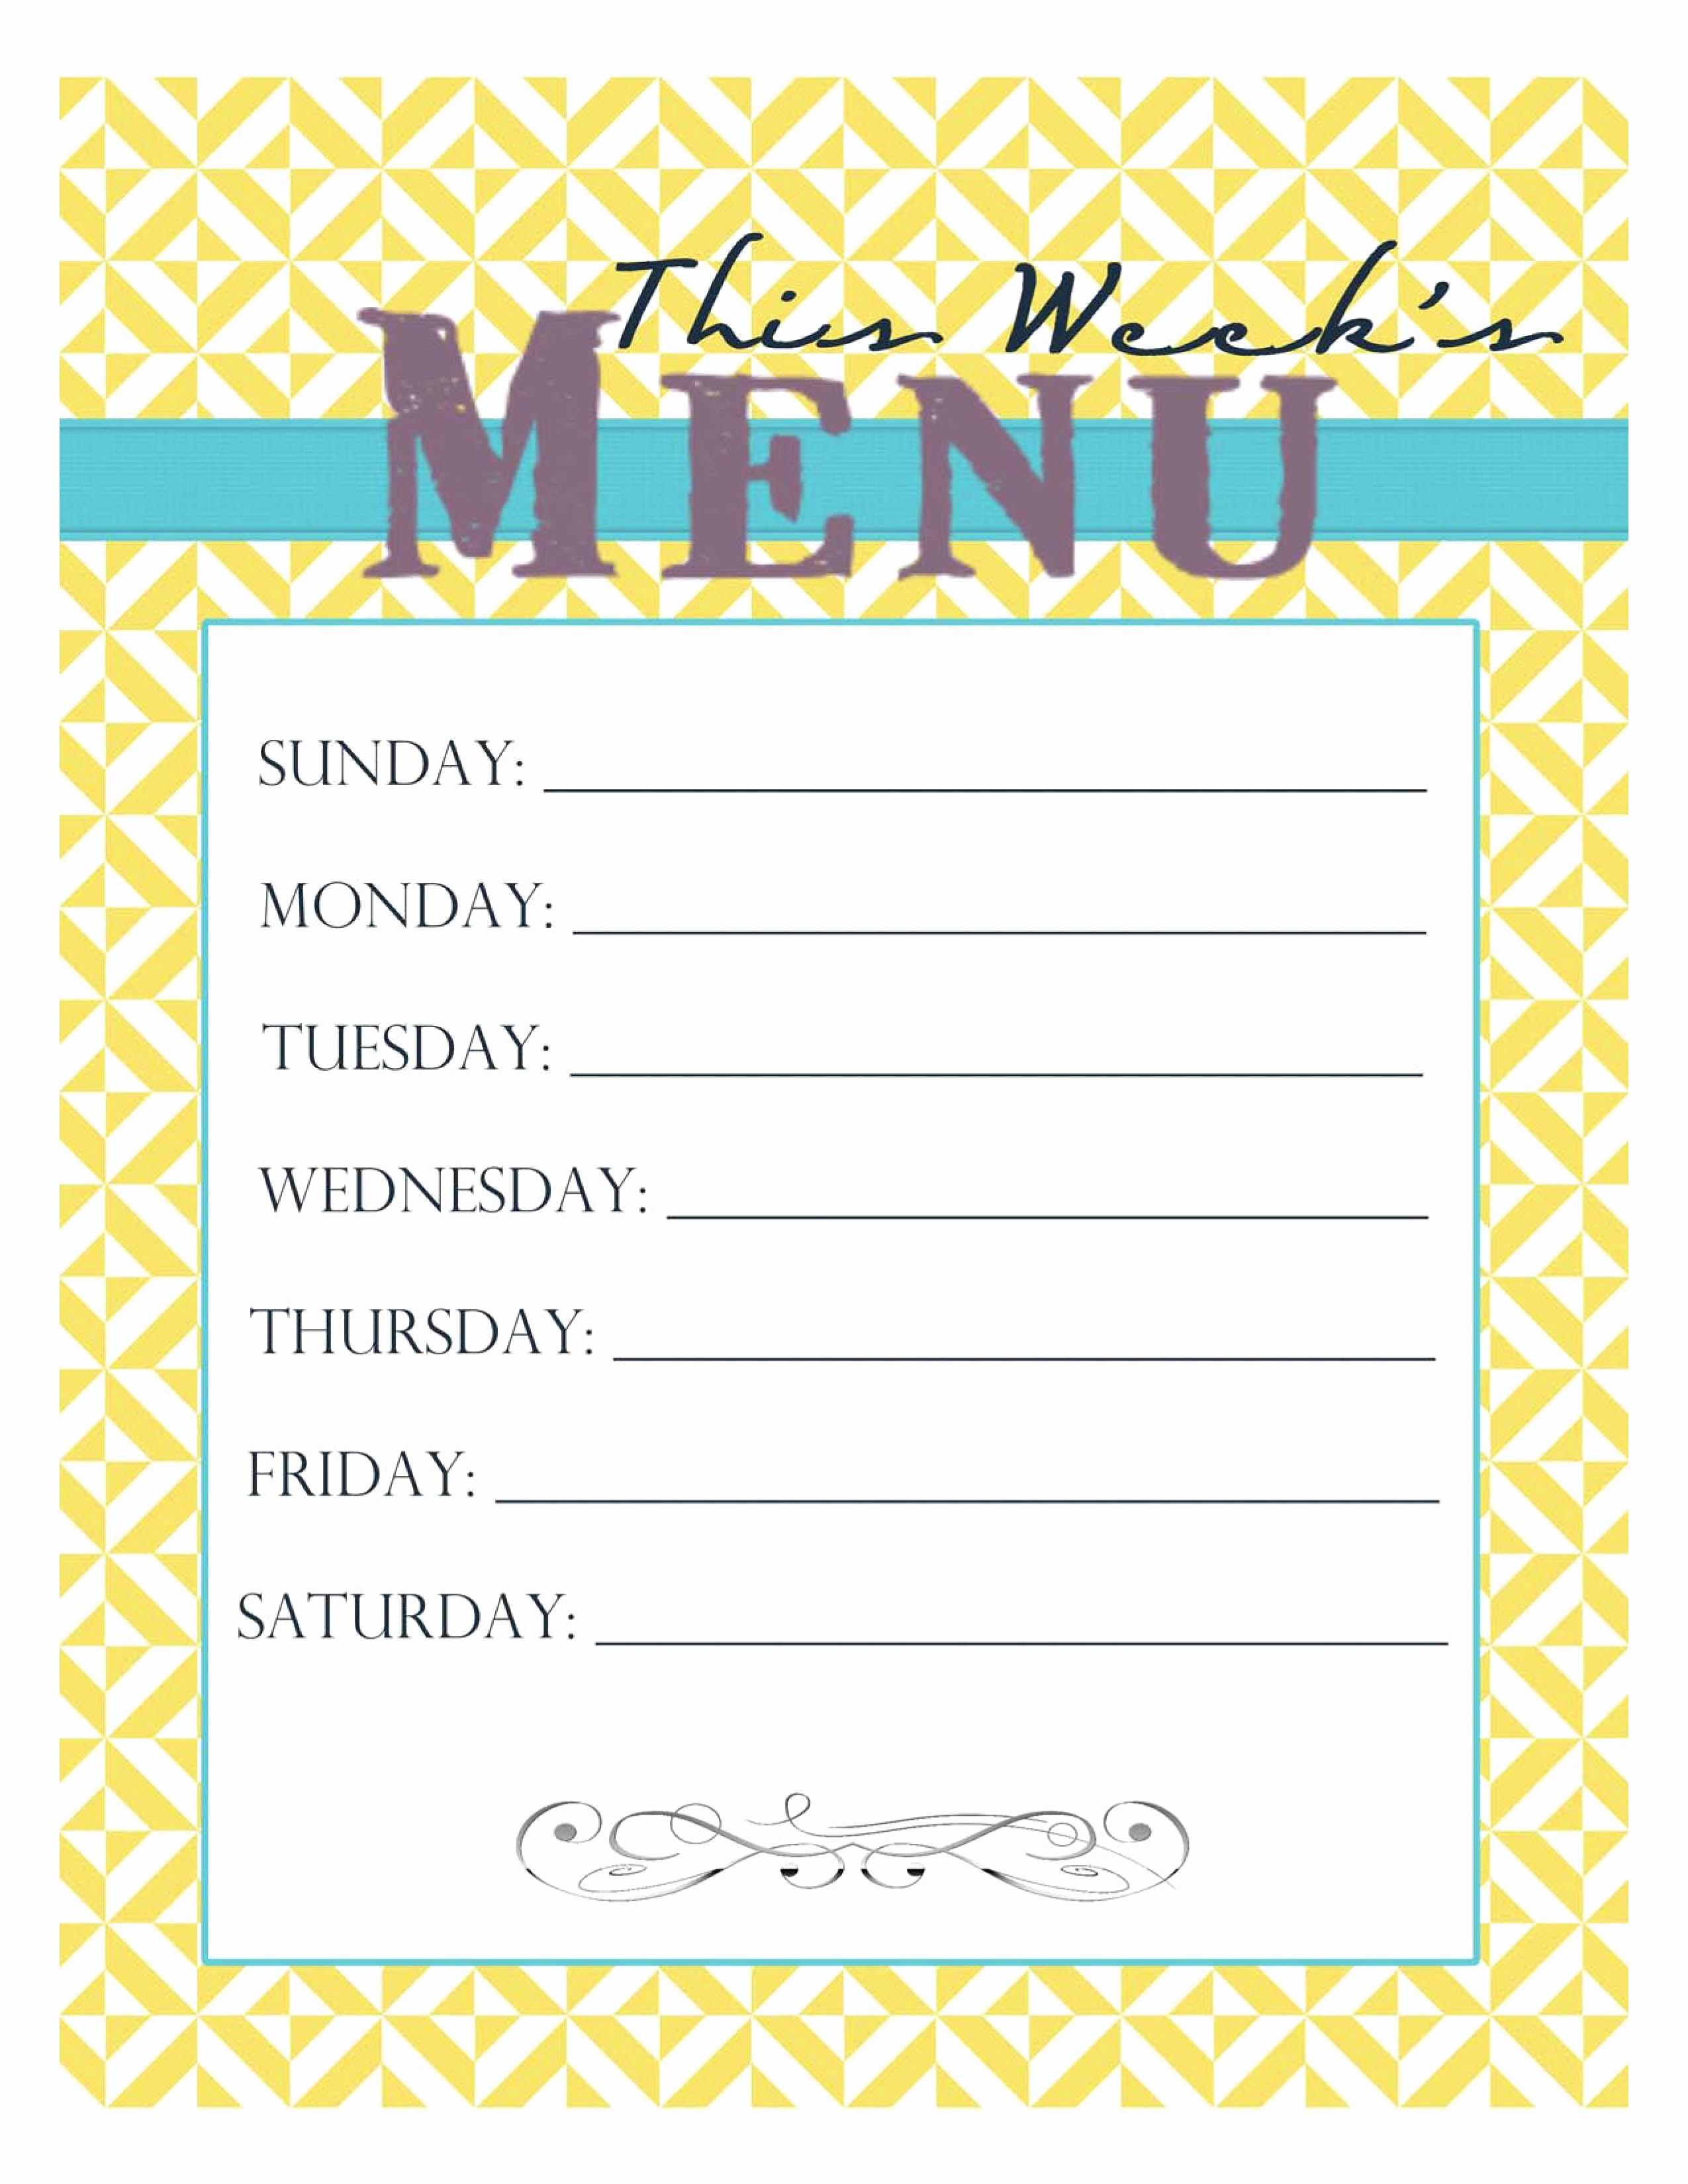 Free Printable Dinner Menu Templates Awesome Free Printable Menu Smitten Blog Designs